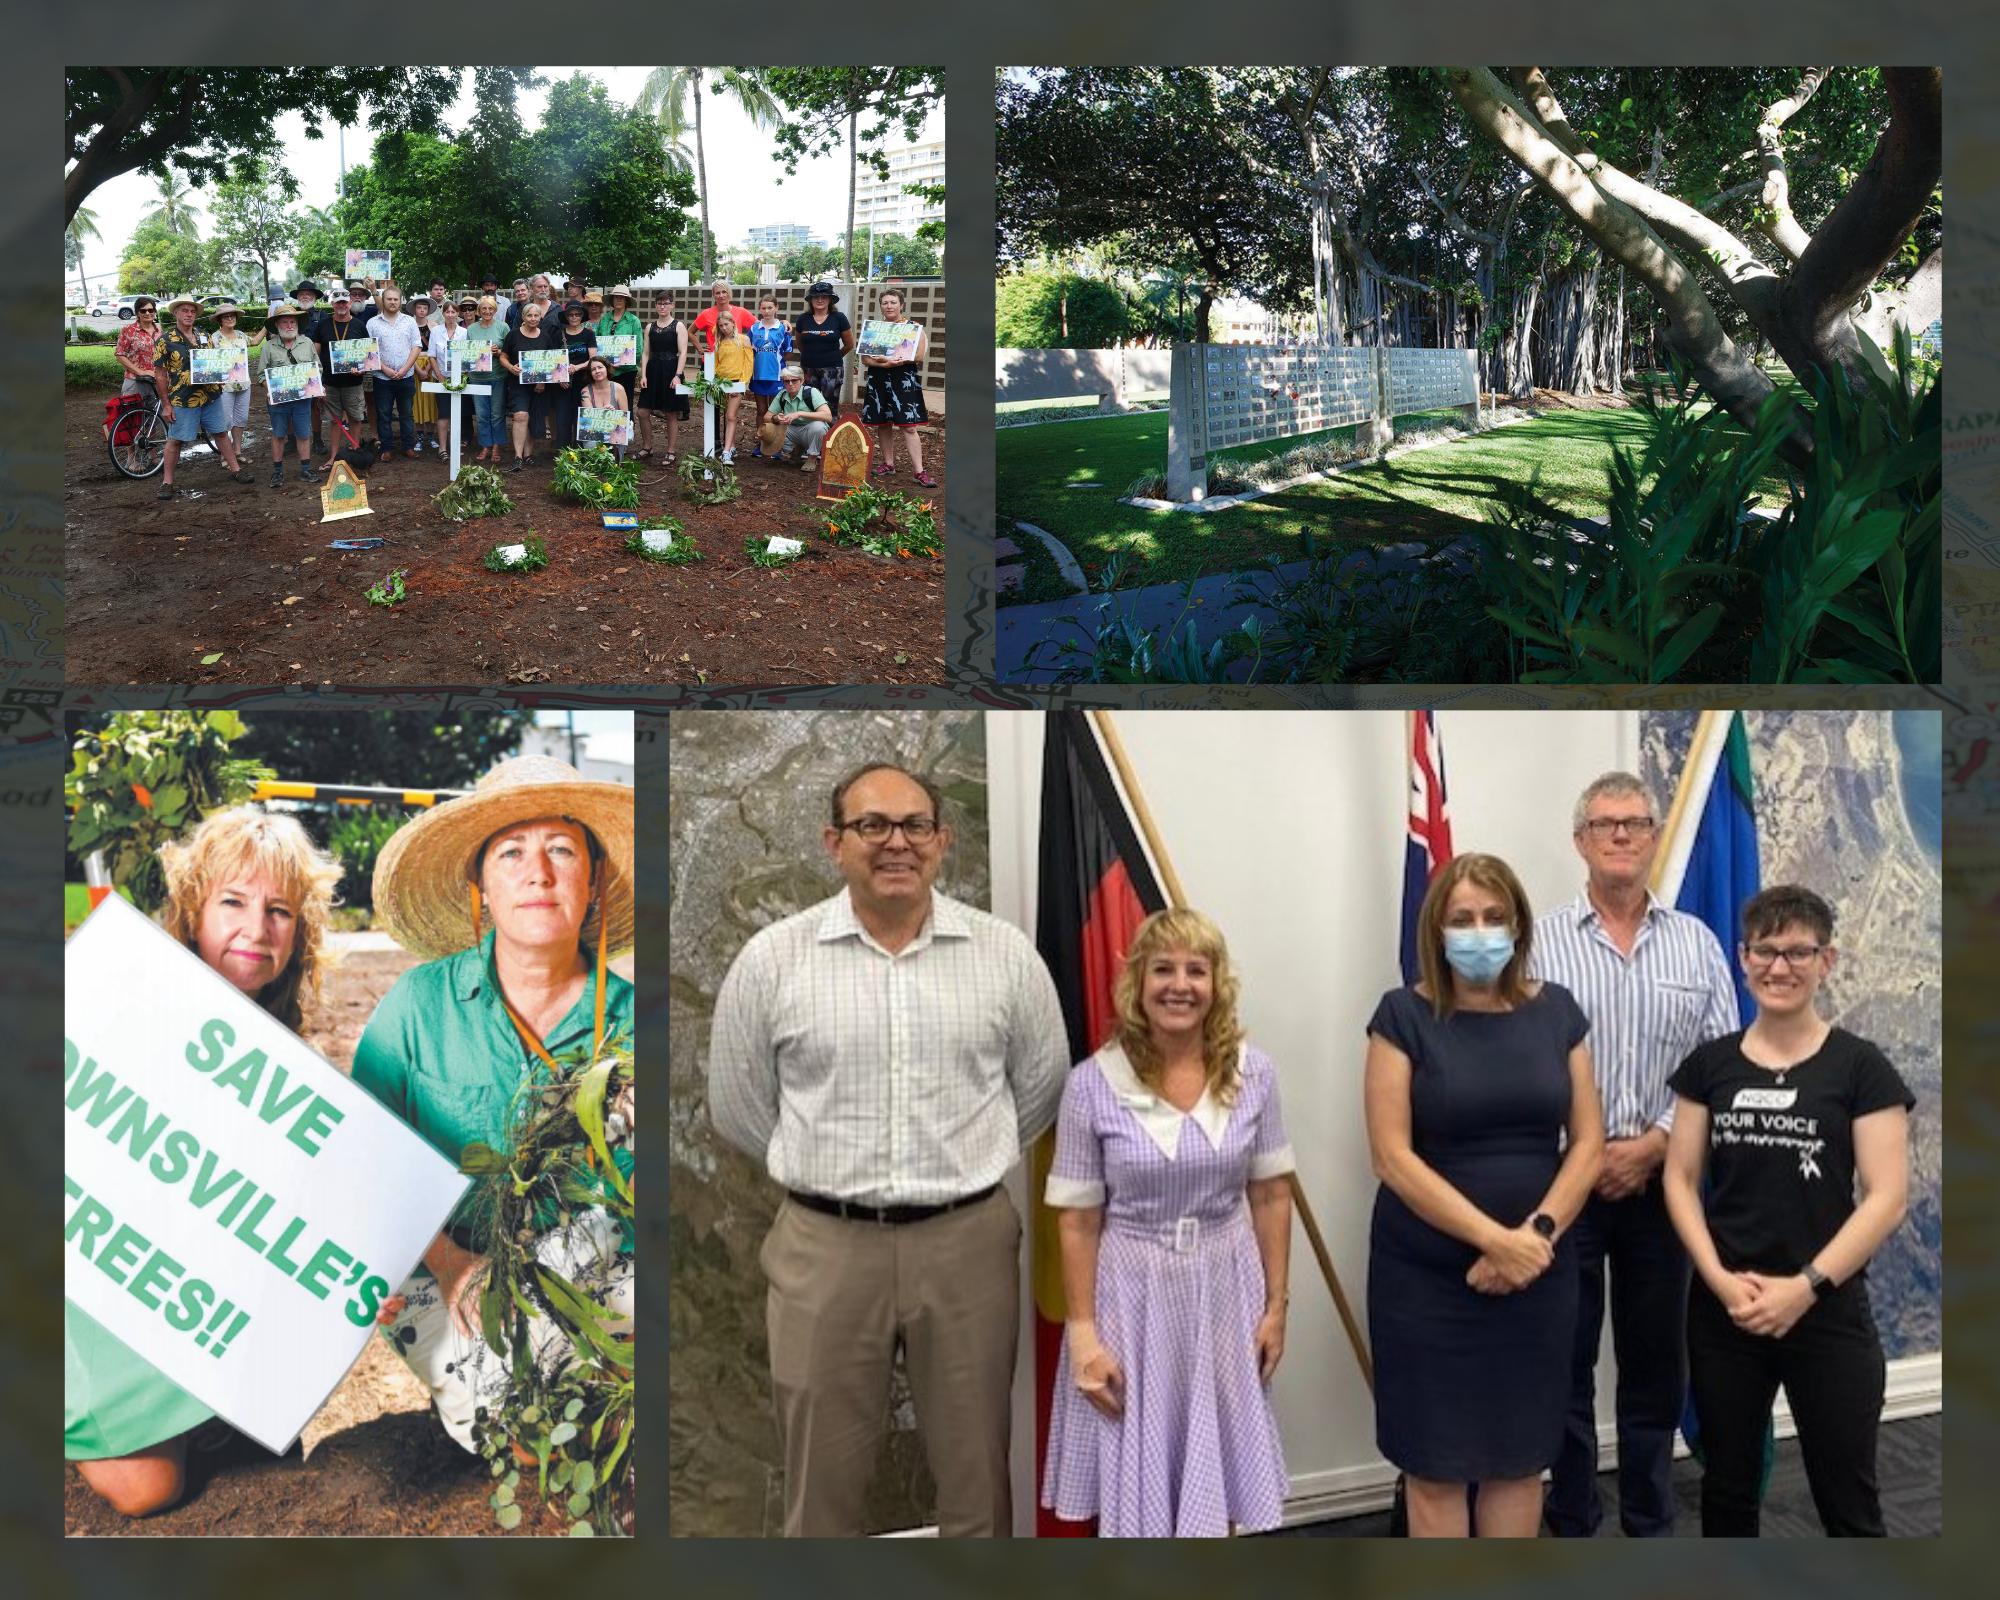 Tree Advocacy Group activities